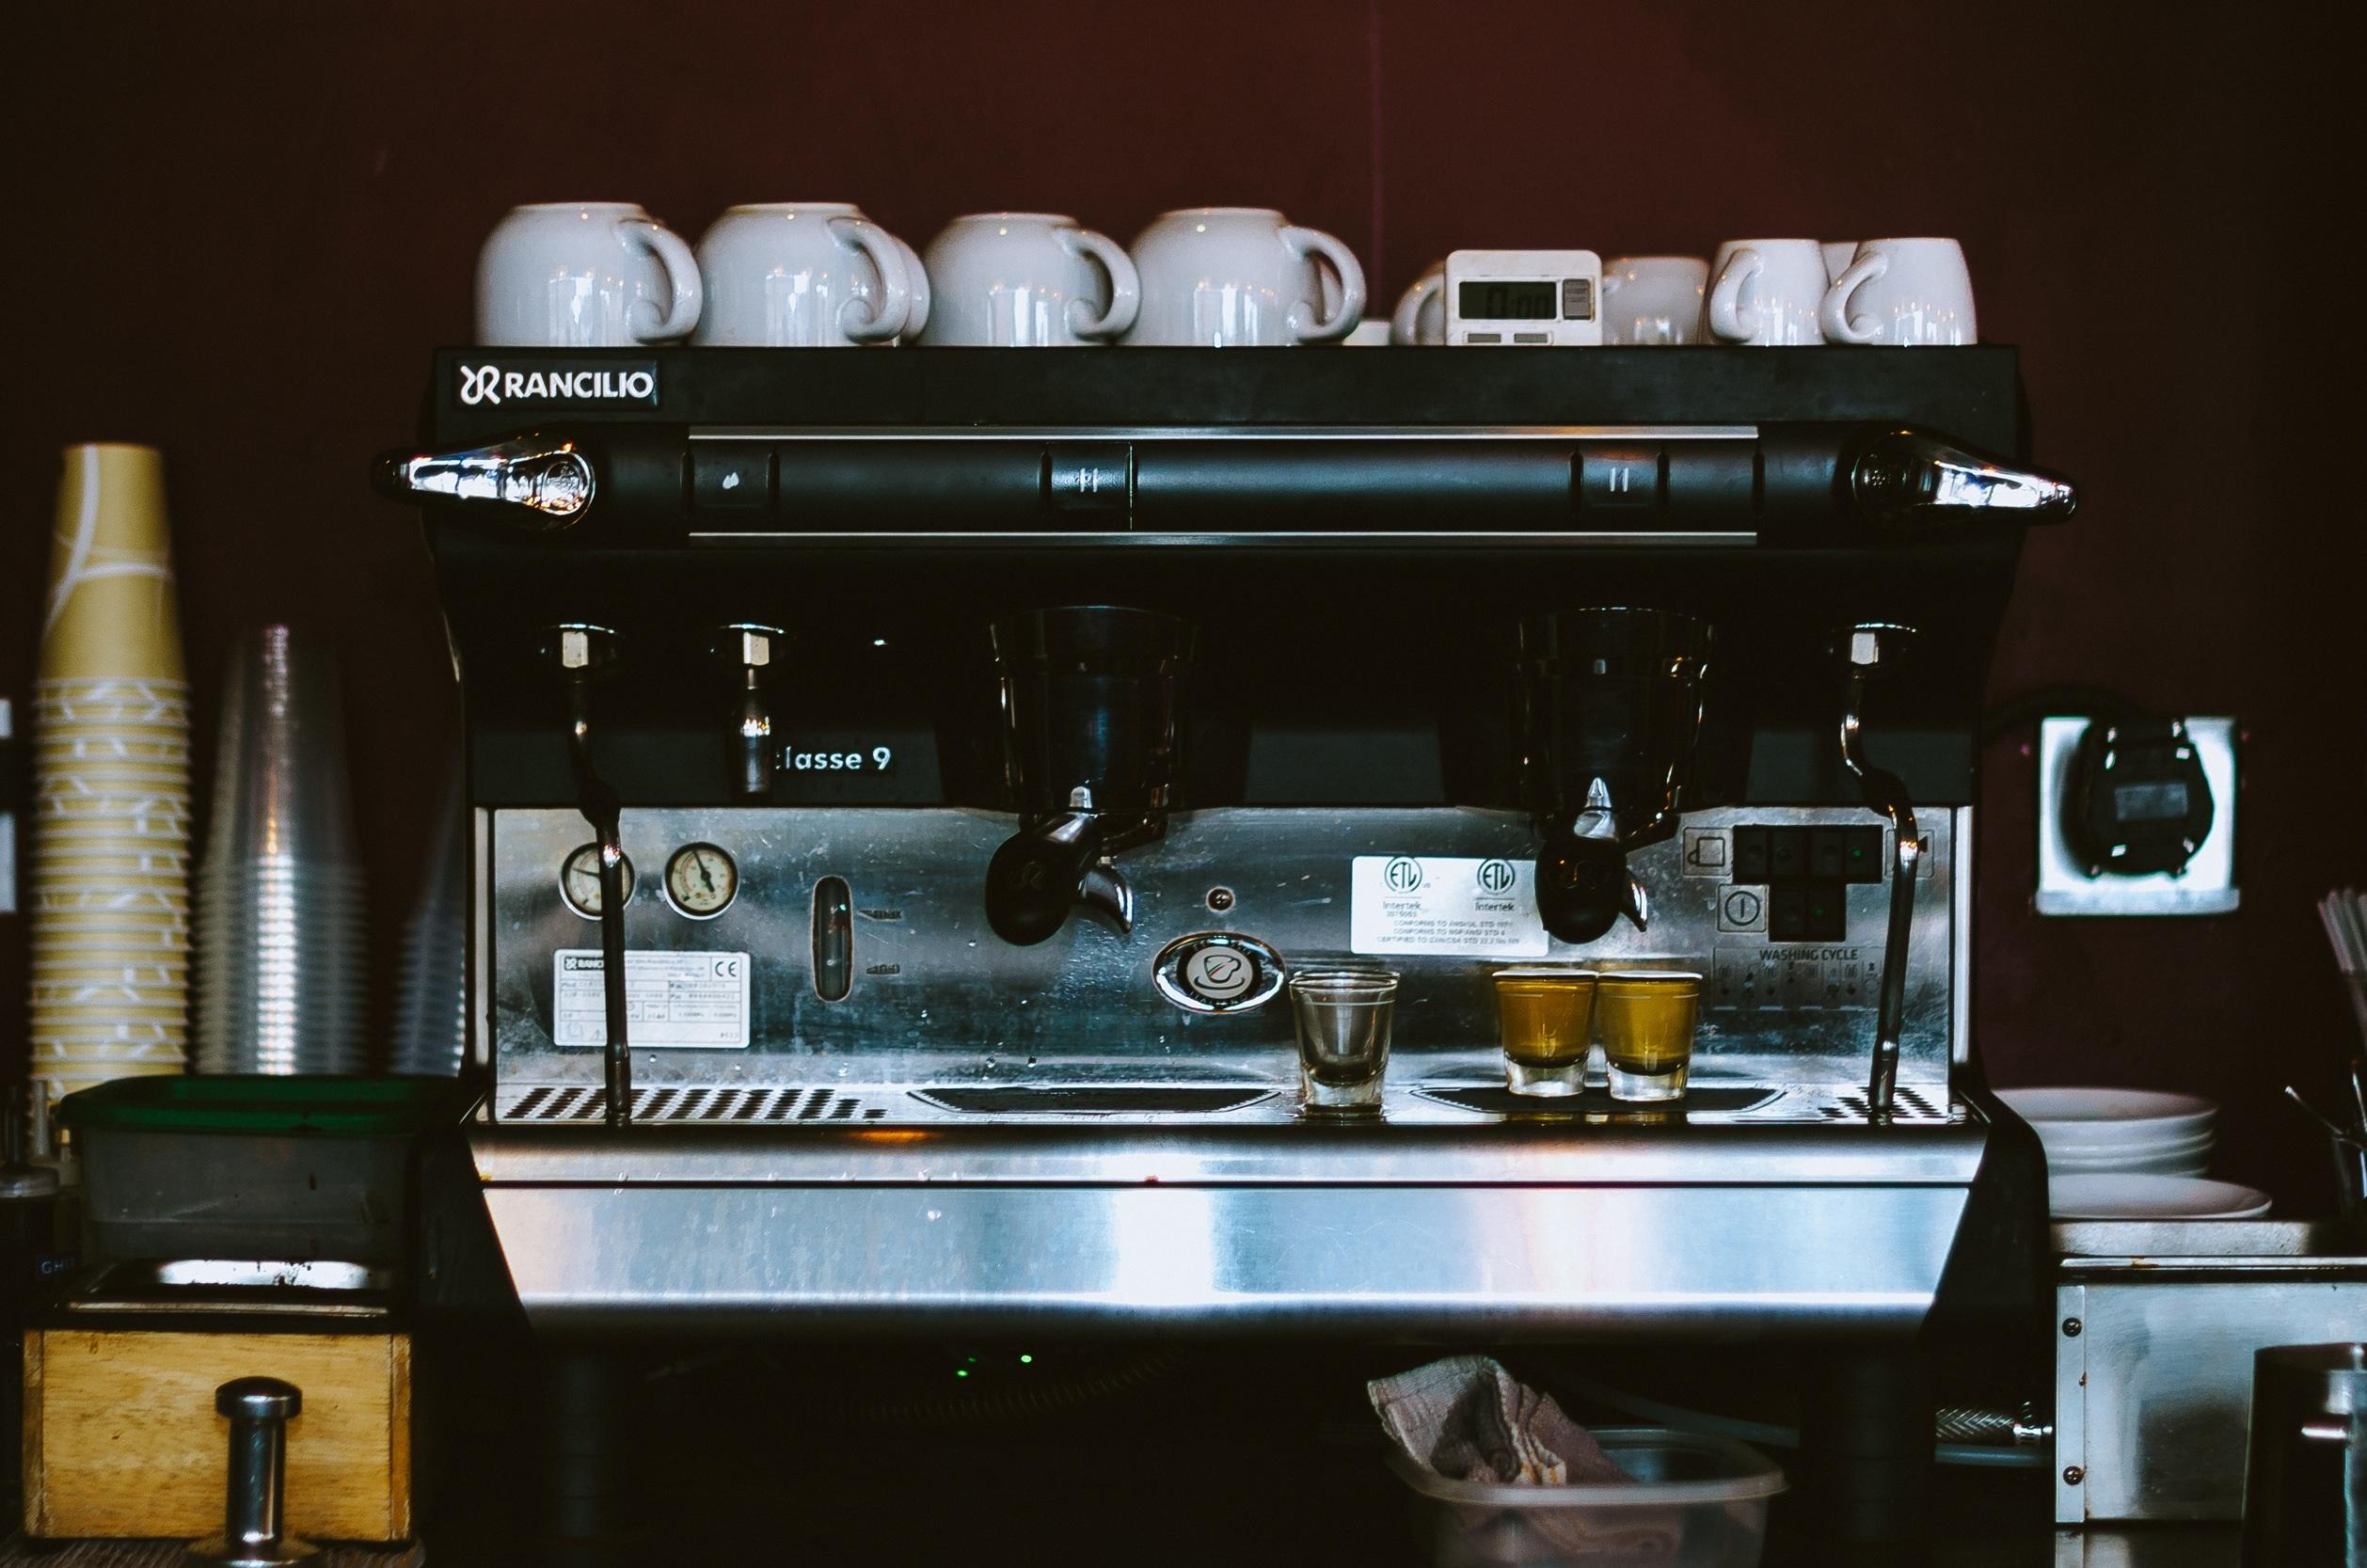 Gambar Meja Kafe Kopi Kaca Restoran Bar Peralatan Dapur